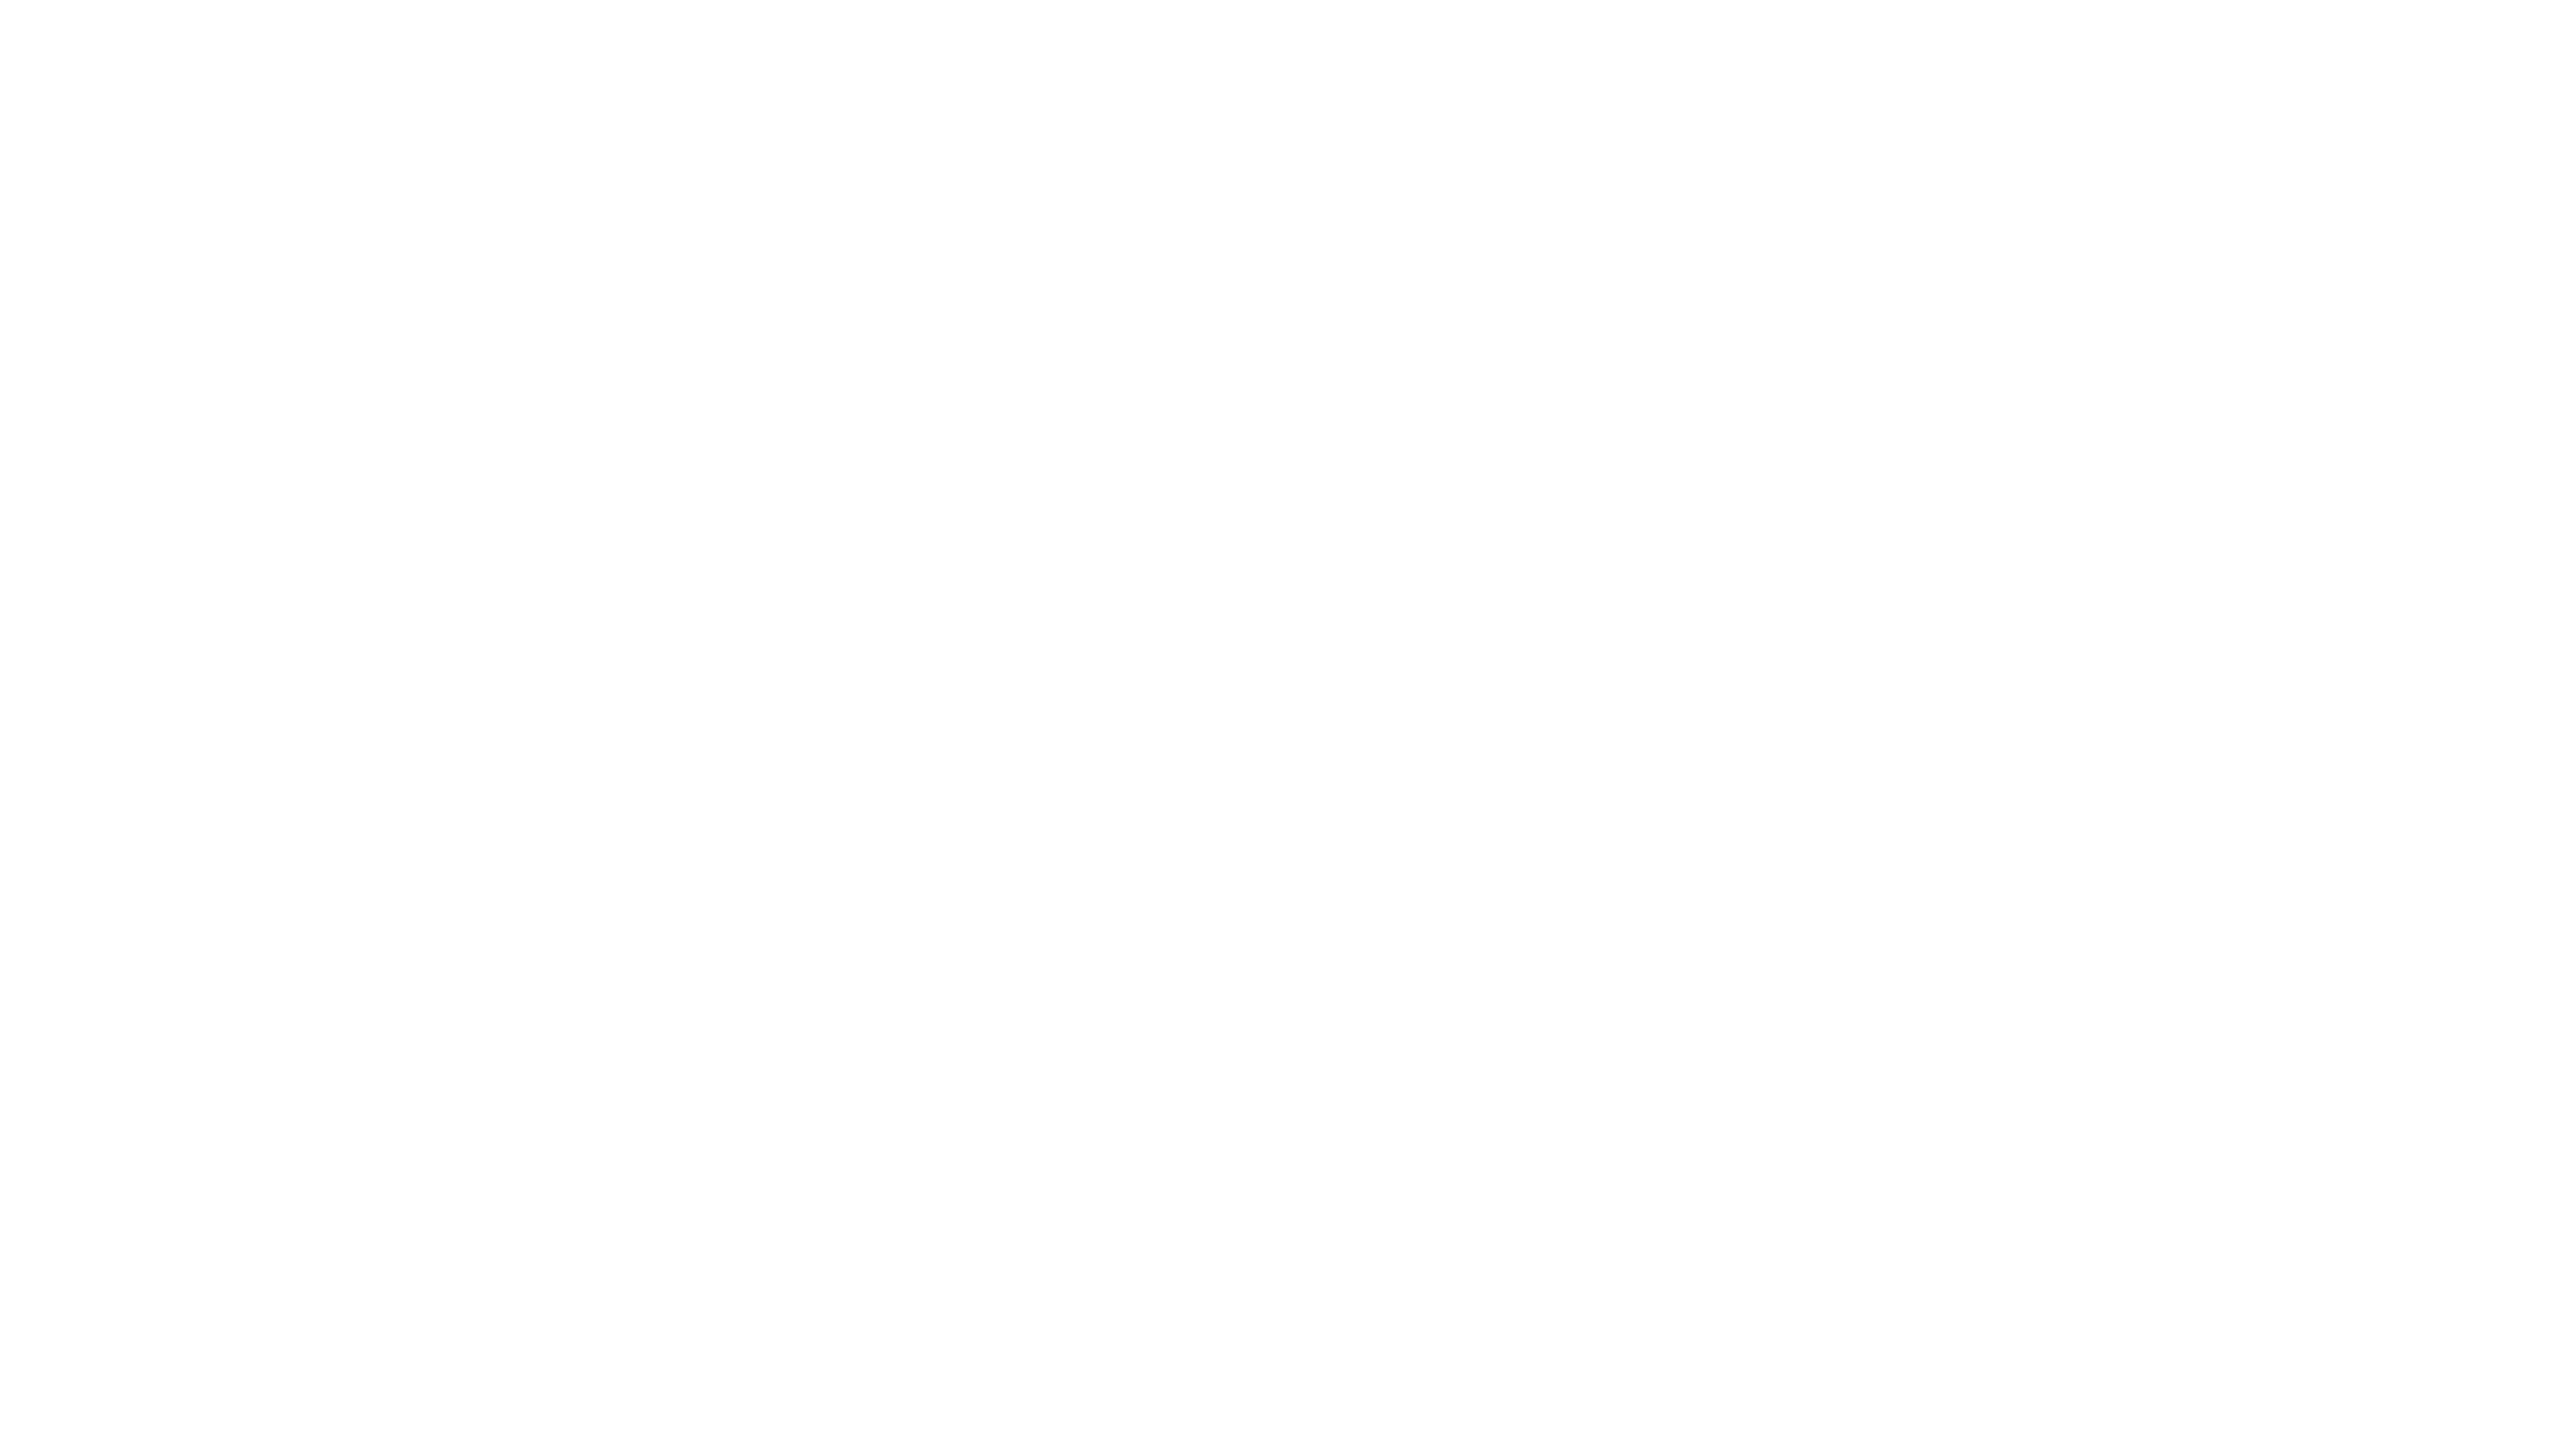 kuay-logo